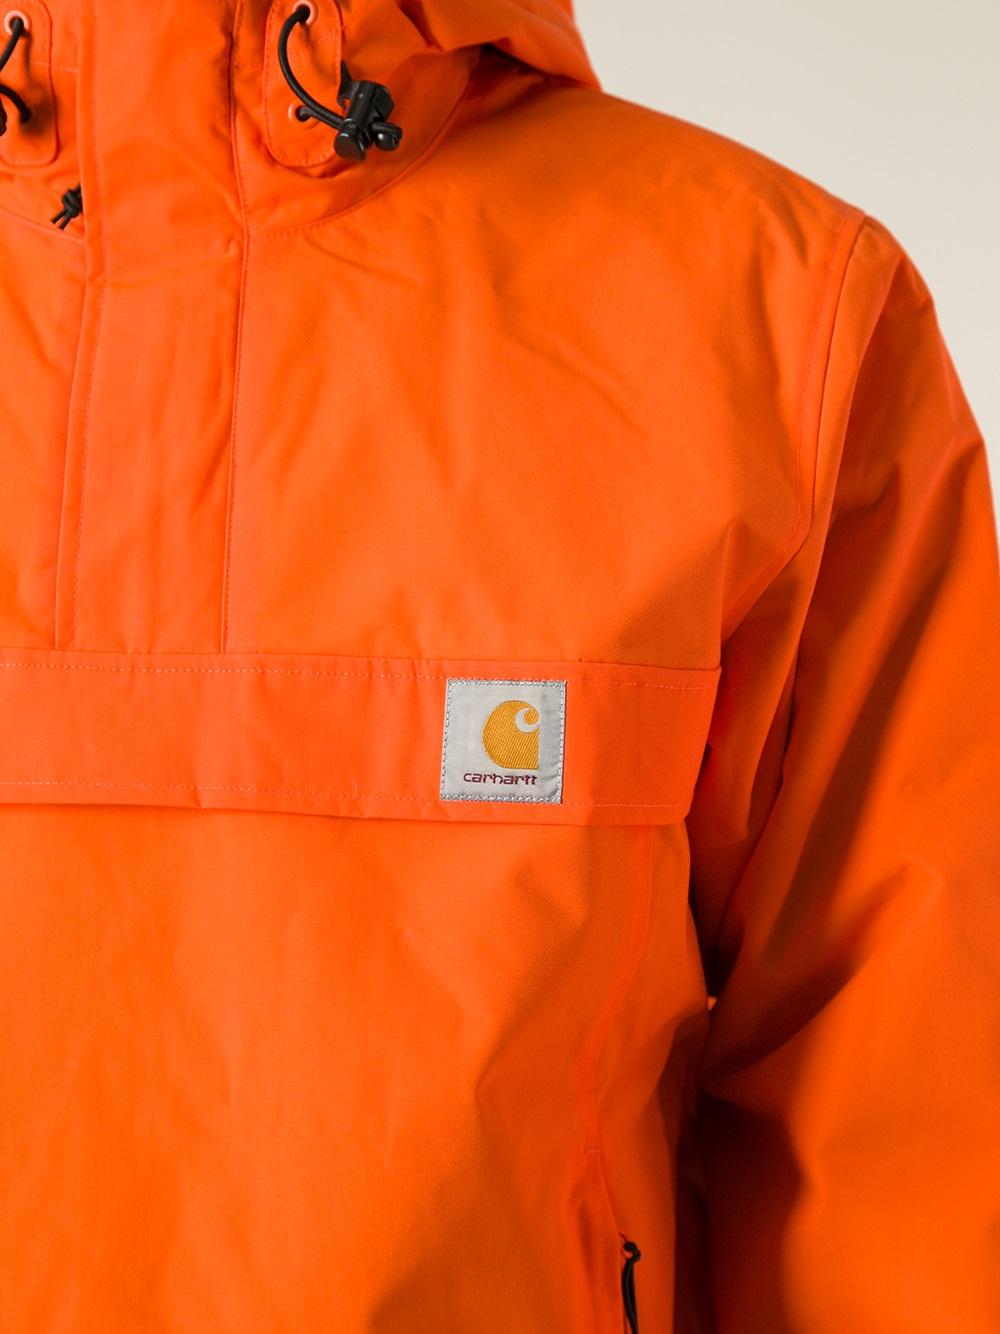 Carhartt Nimbus Pullover Jacket in Yellow & Orange (Orange) for Men